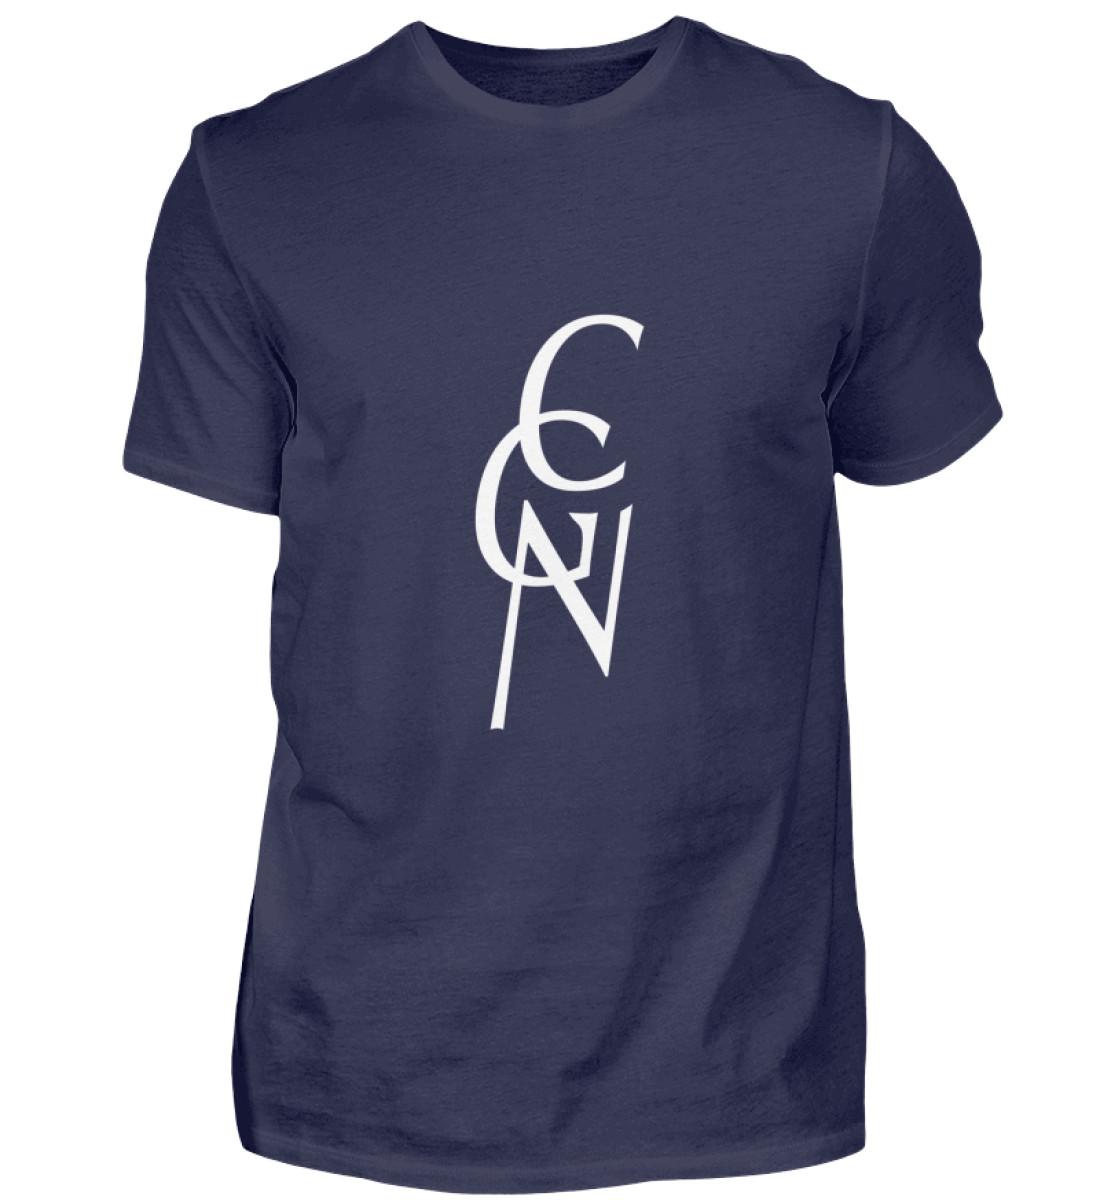 CGN - T-Shirt Herren - Herren Shirt-198